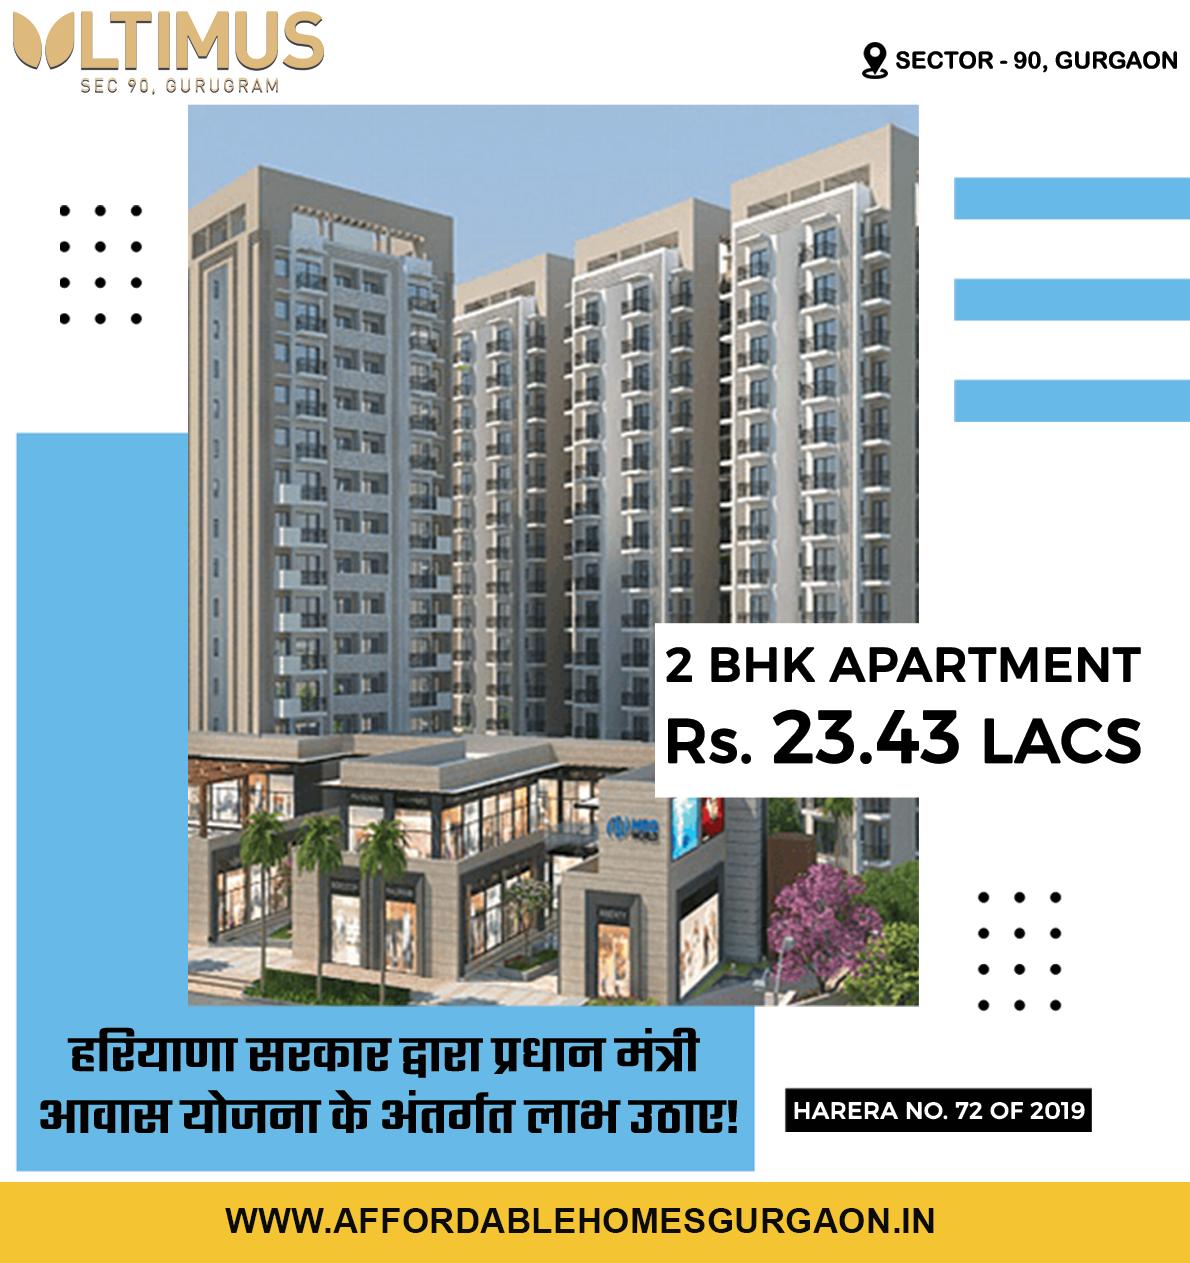 Mrg World Ultimus Affordable Housing Sector 90 Gurgaon